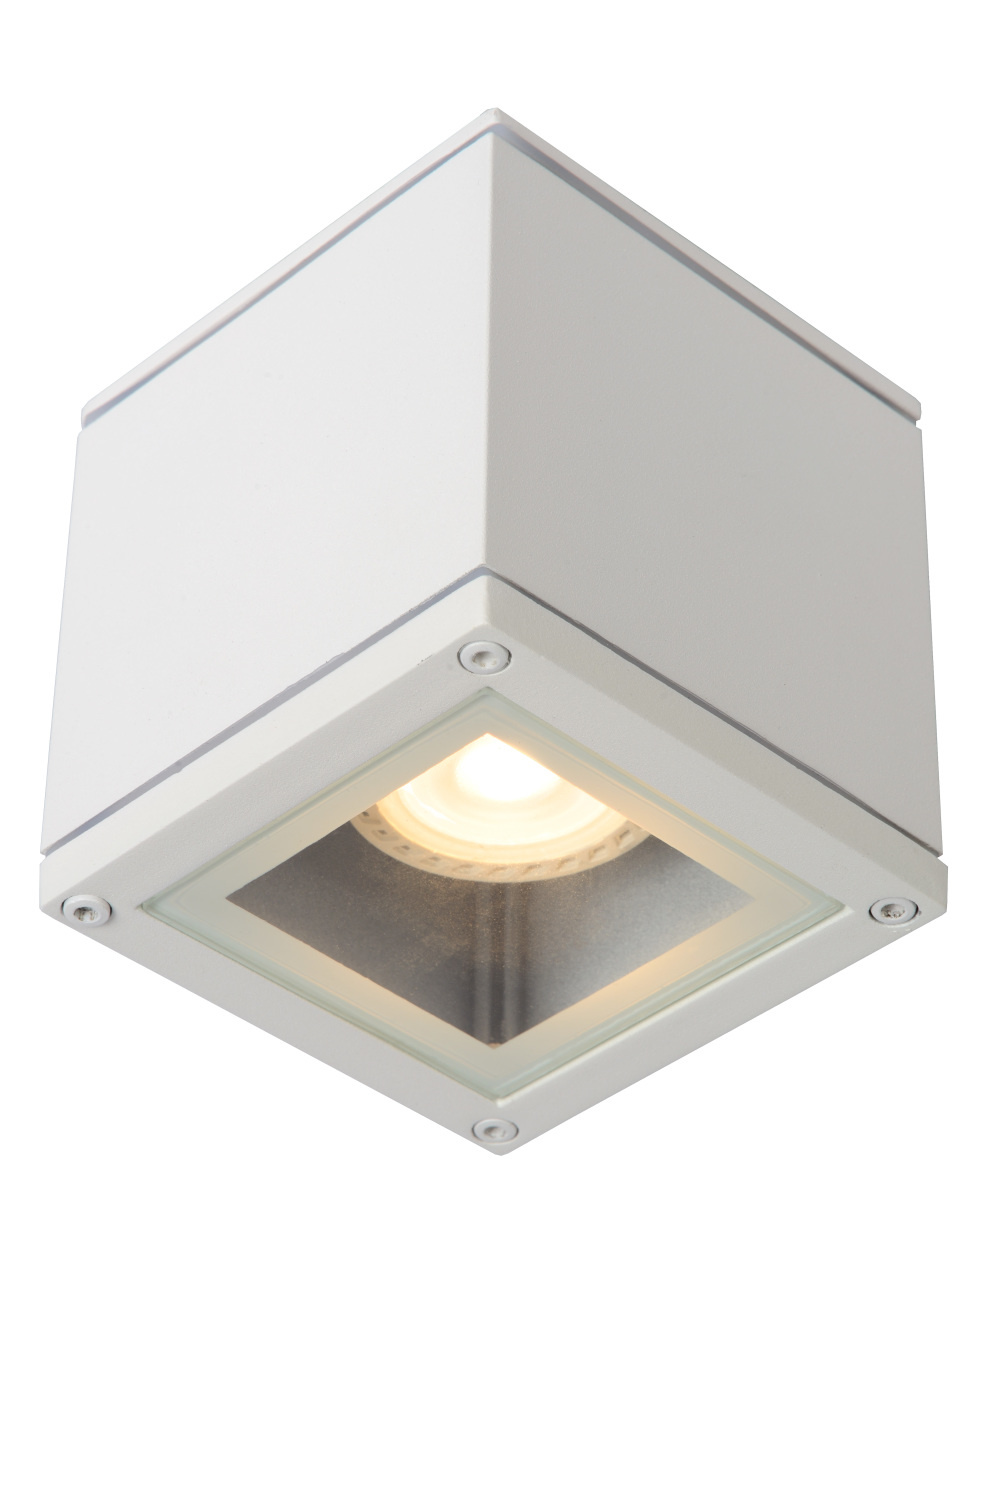 Lucide AVEN Plafondspot Vierkant Gu10/50W Wit